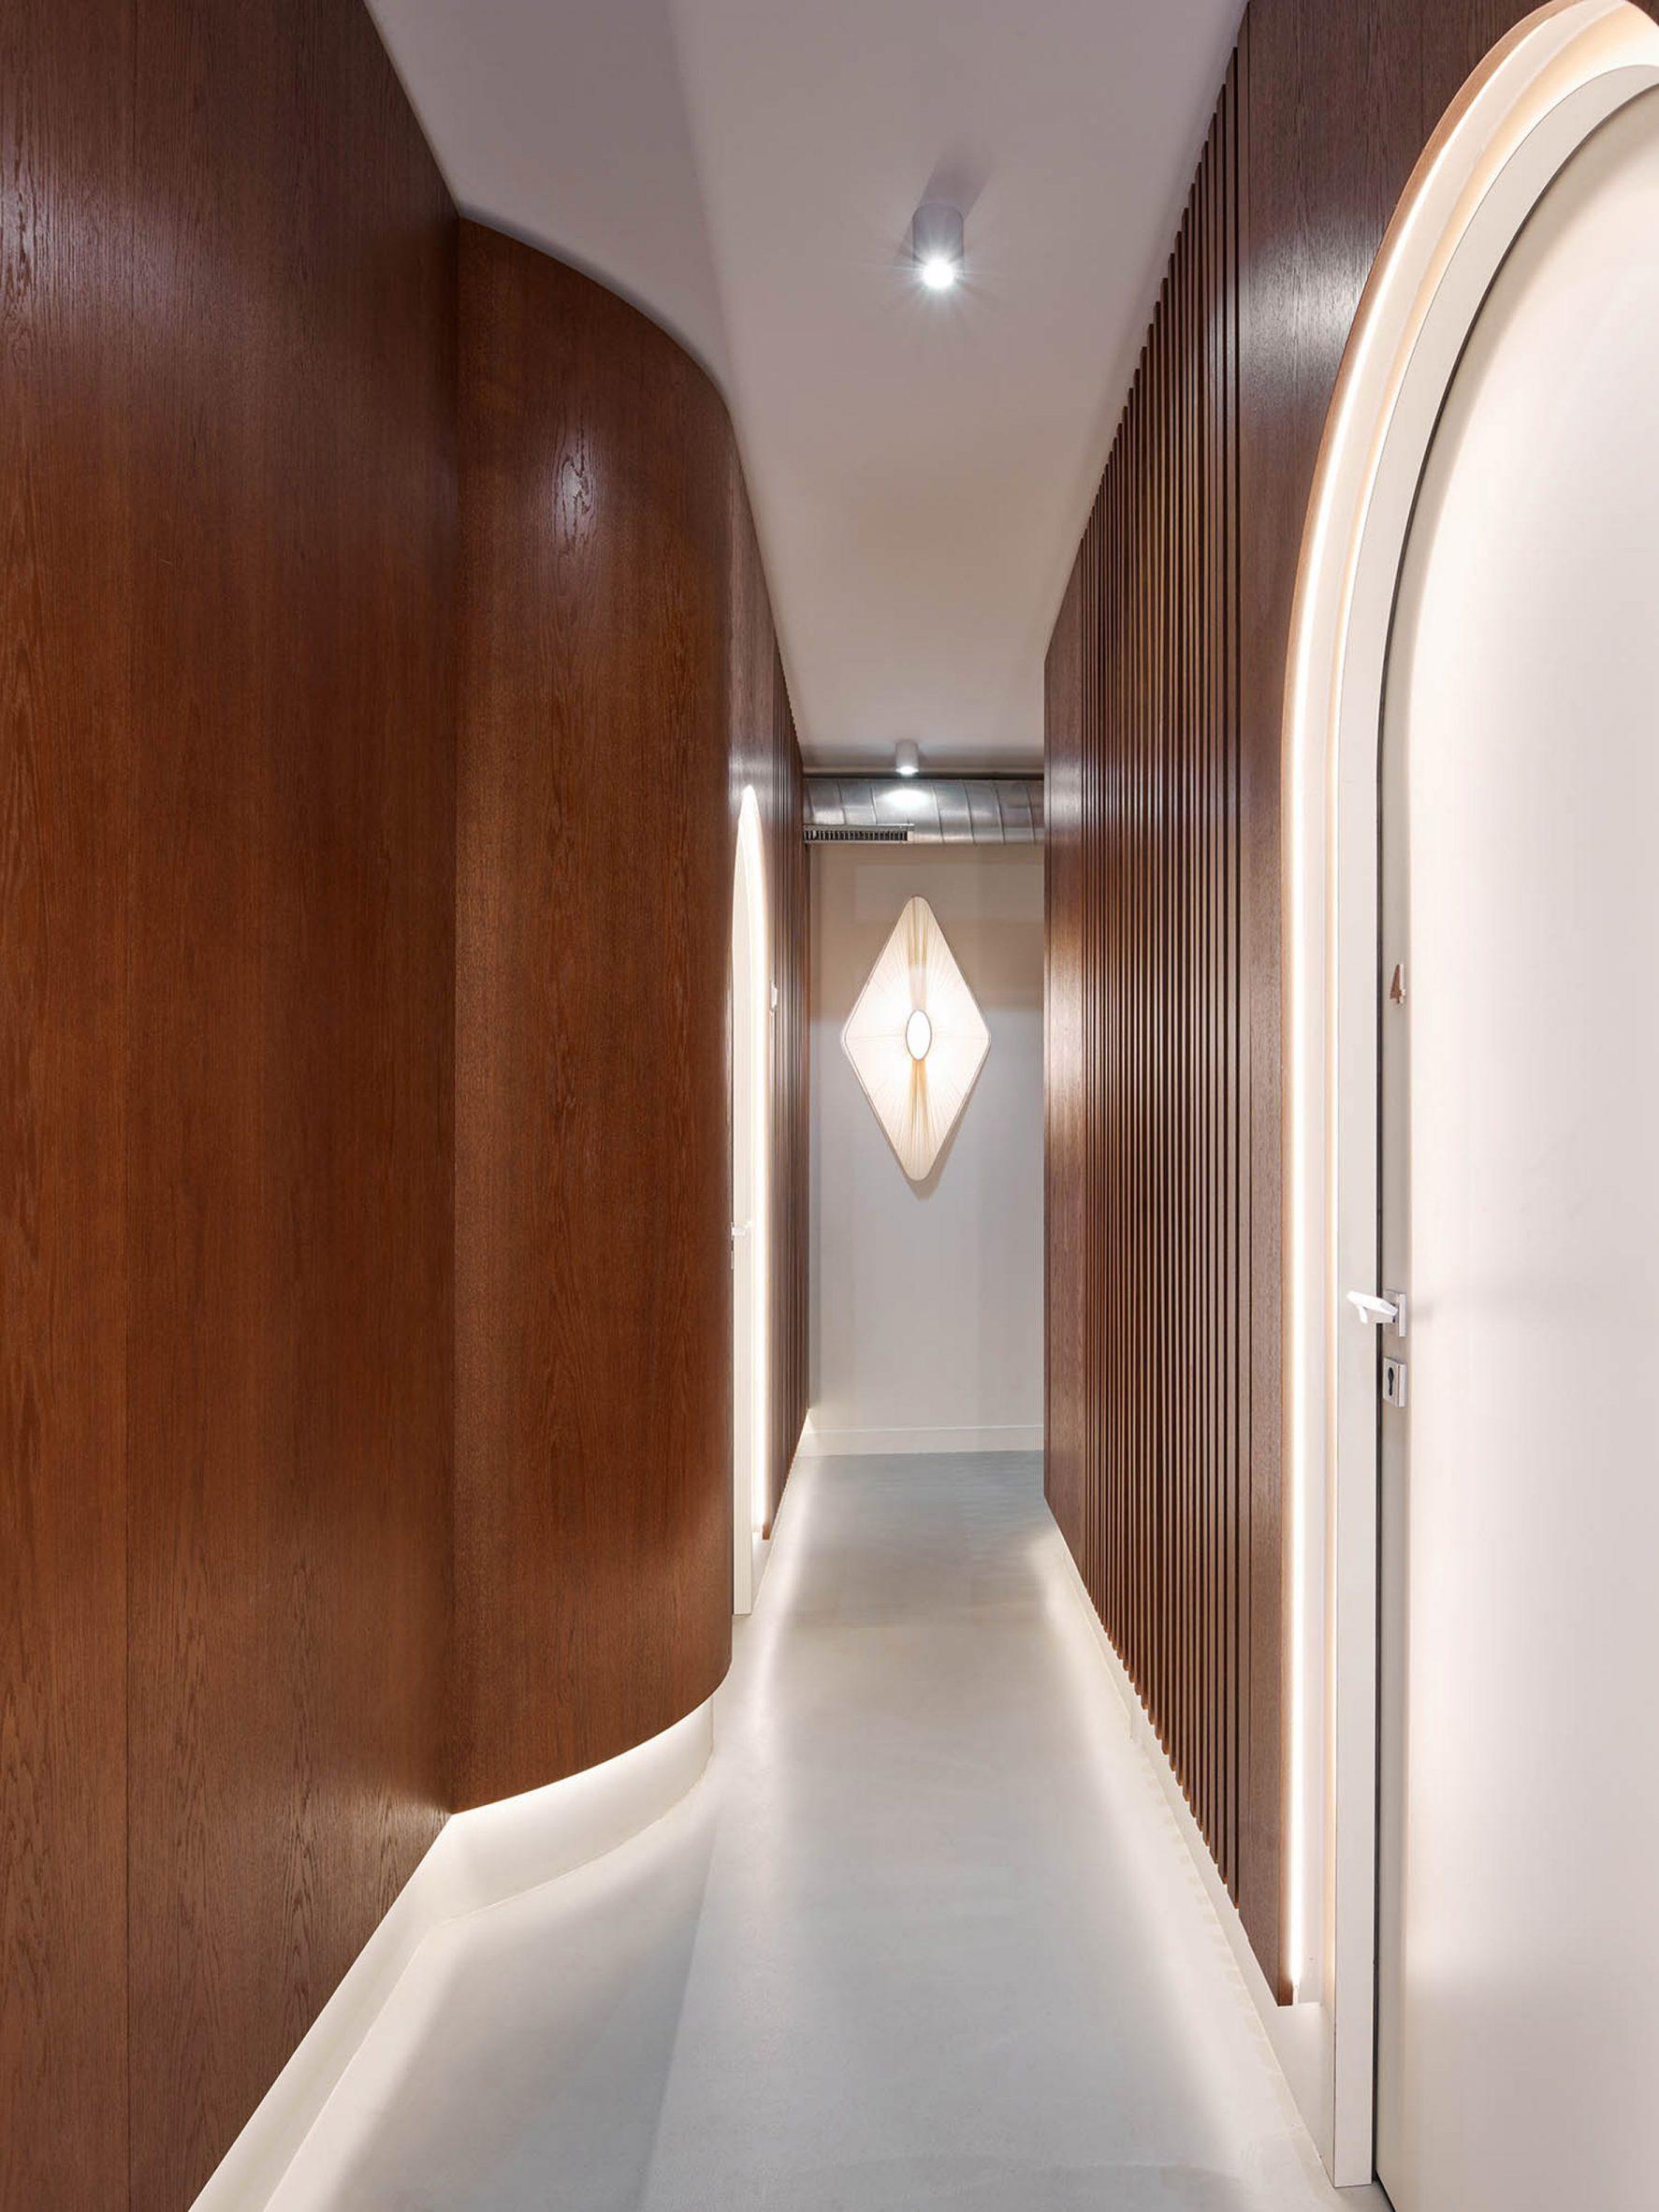 The hallway of Paris Dental Studio